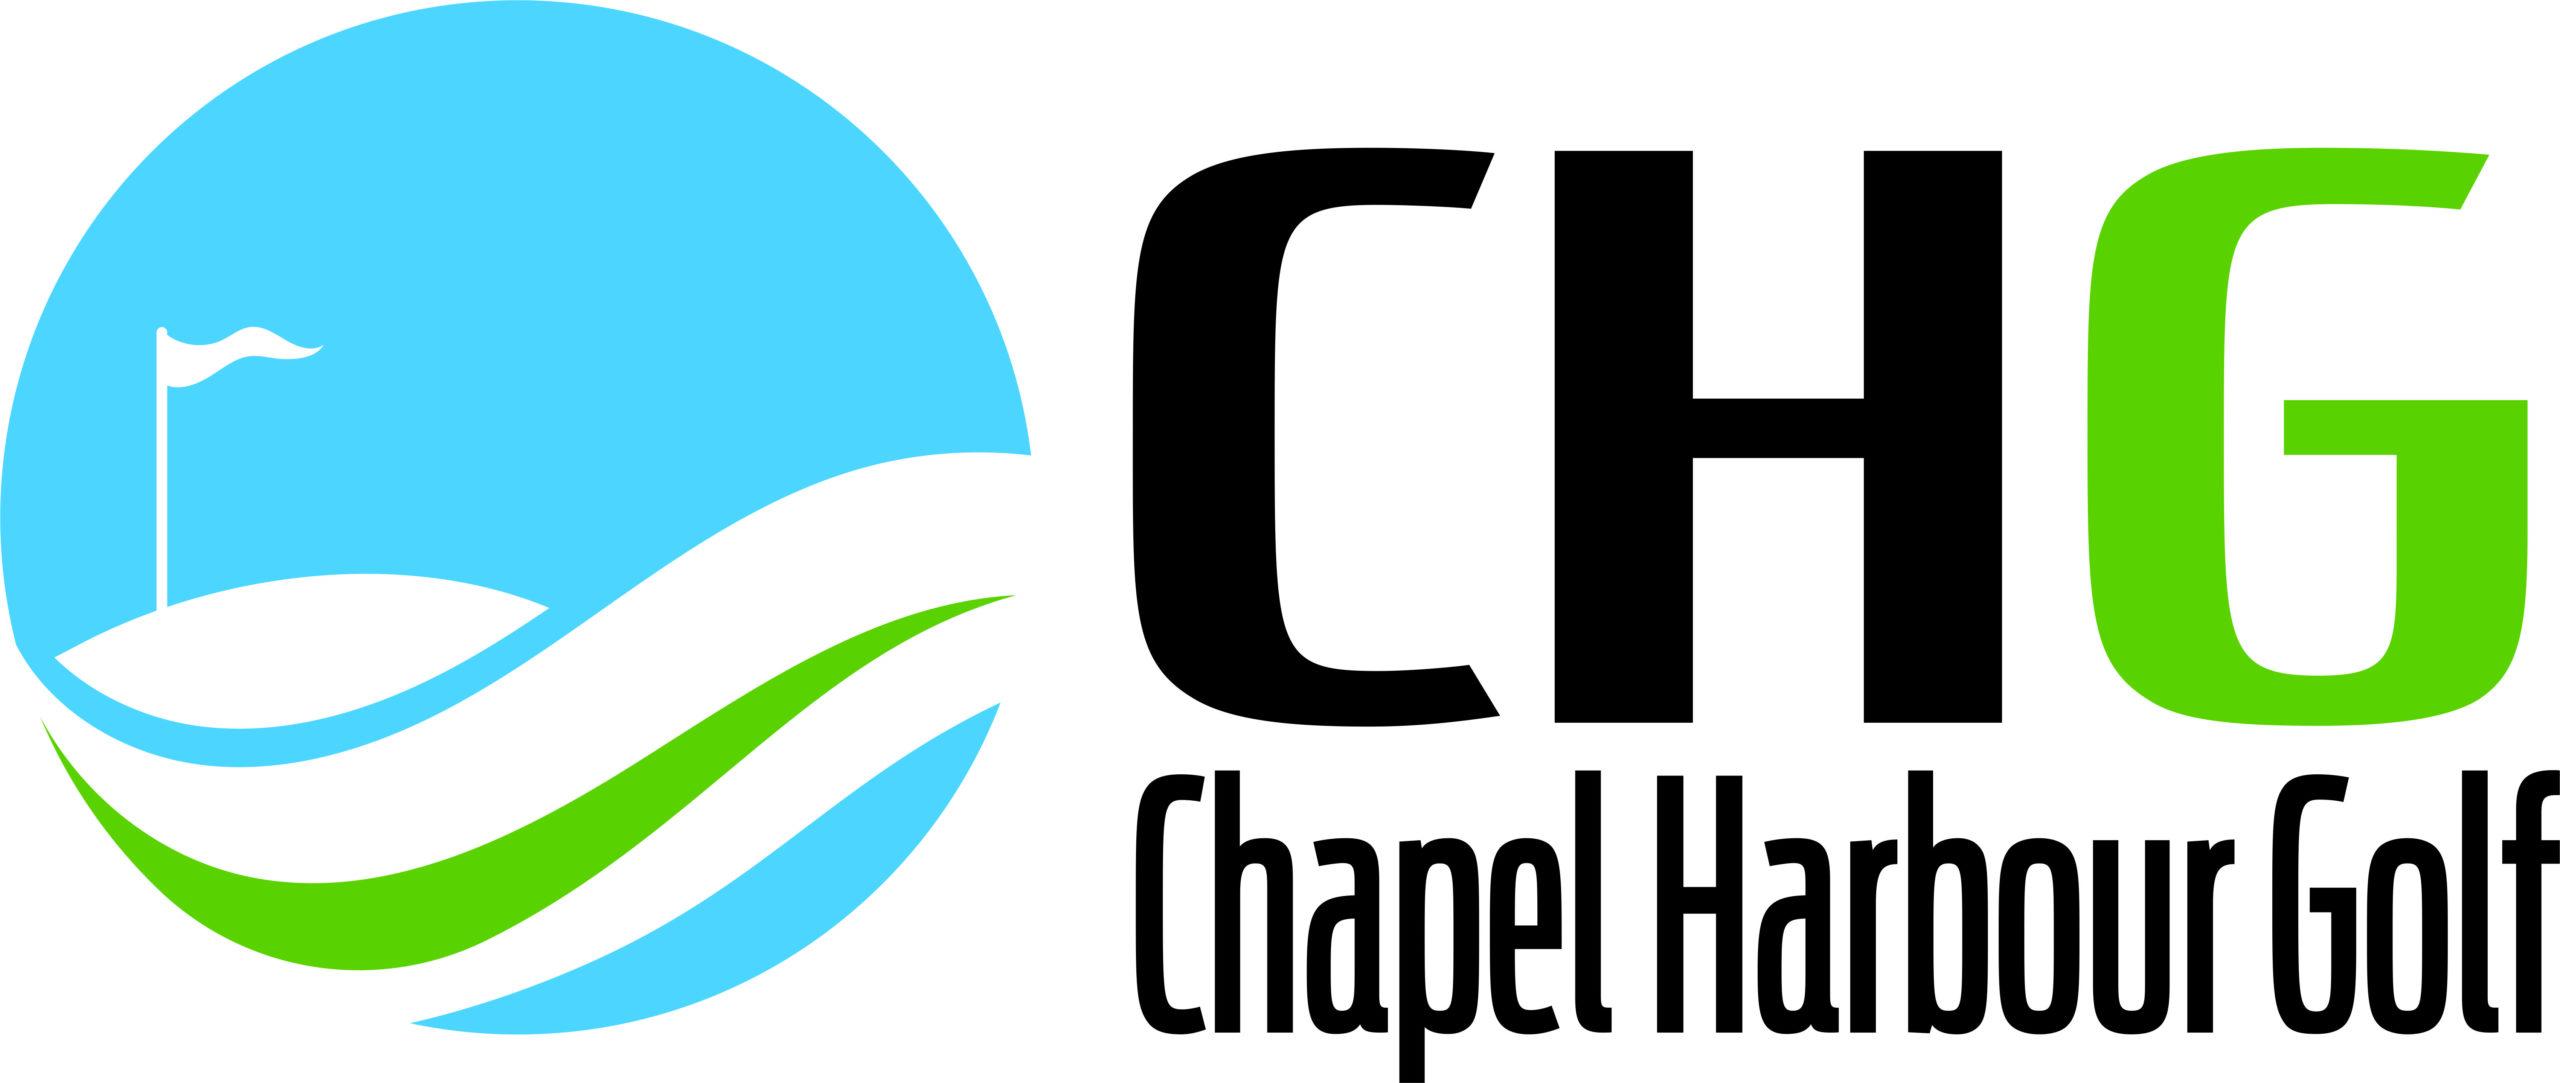 Chapel Harbour Golf